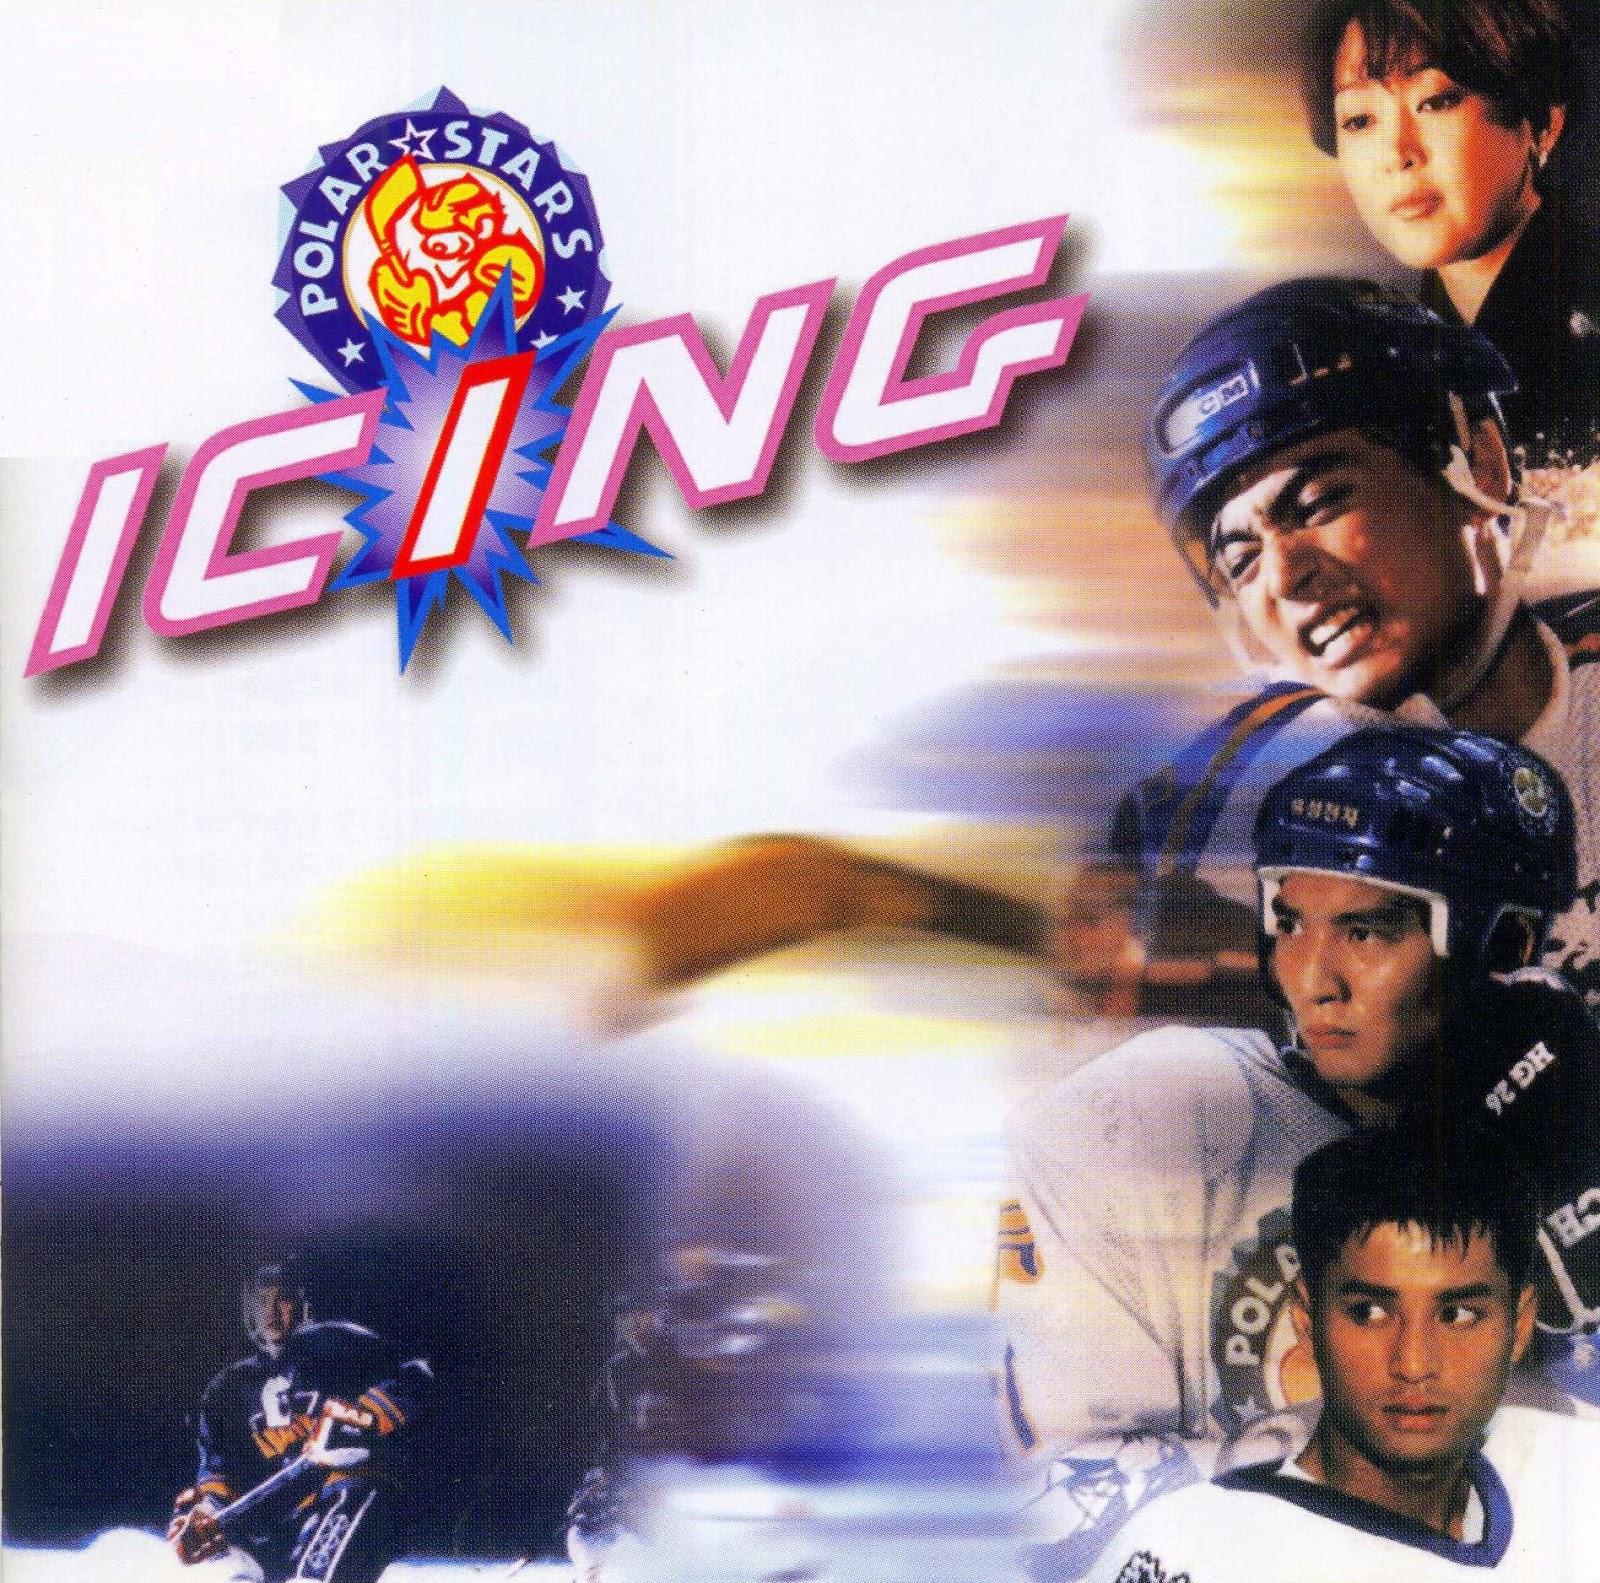 OST - 아이싱 (Icing)